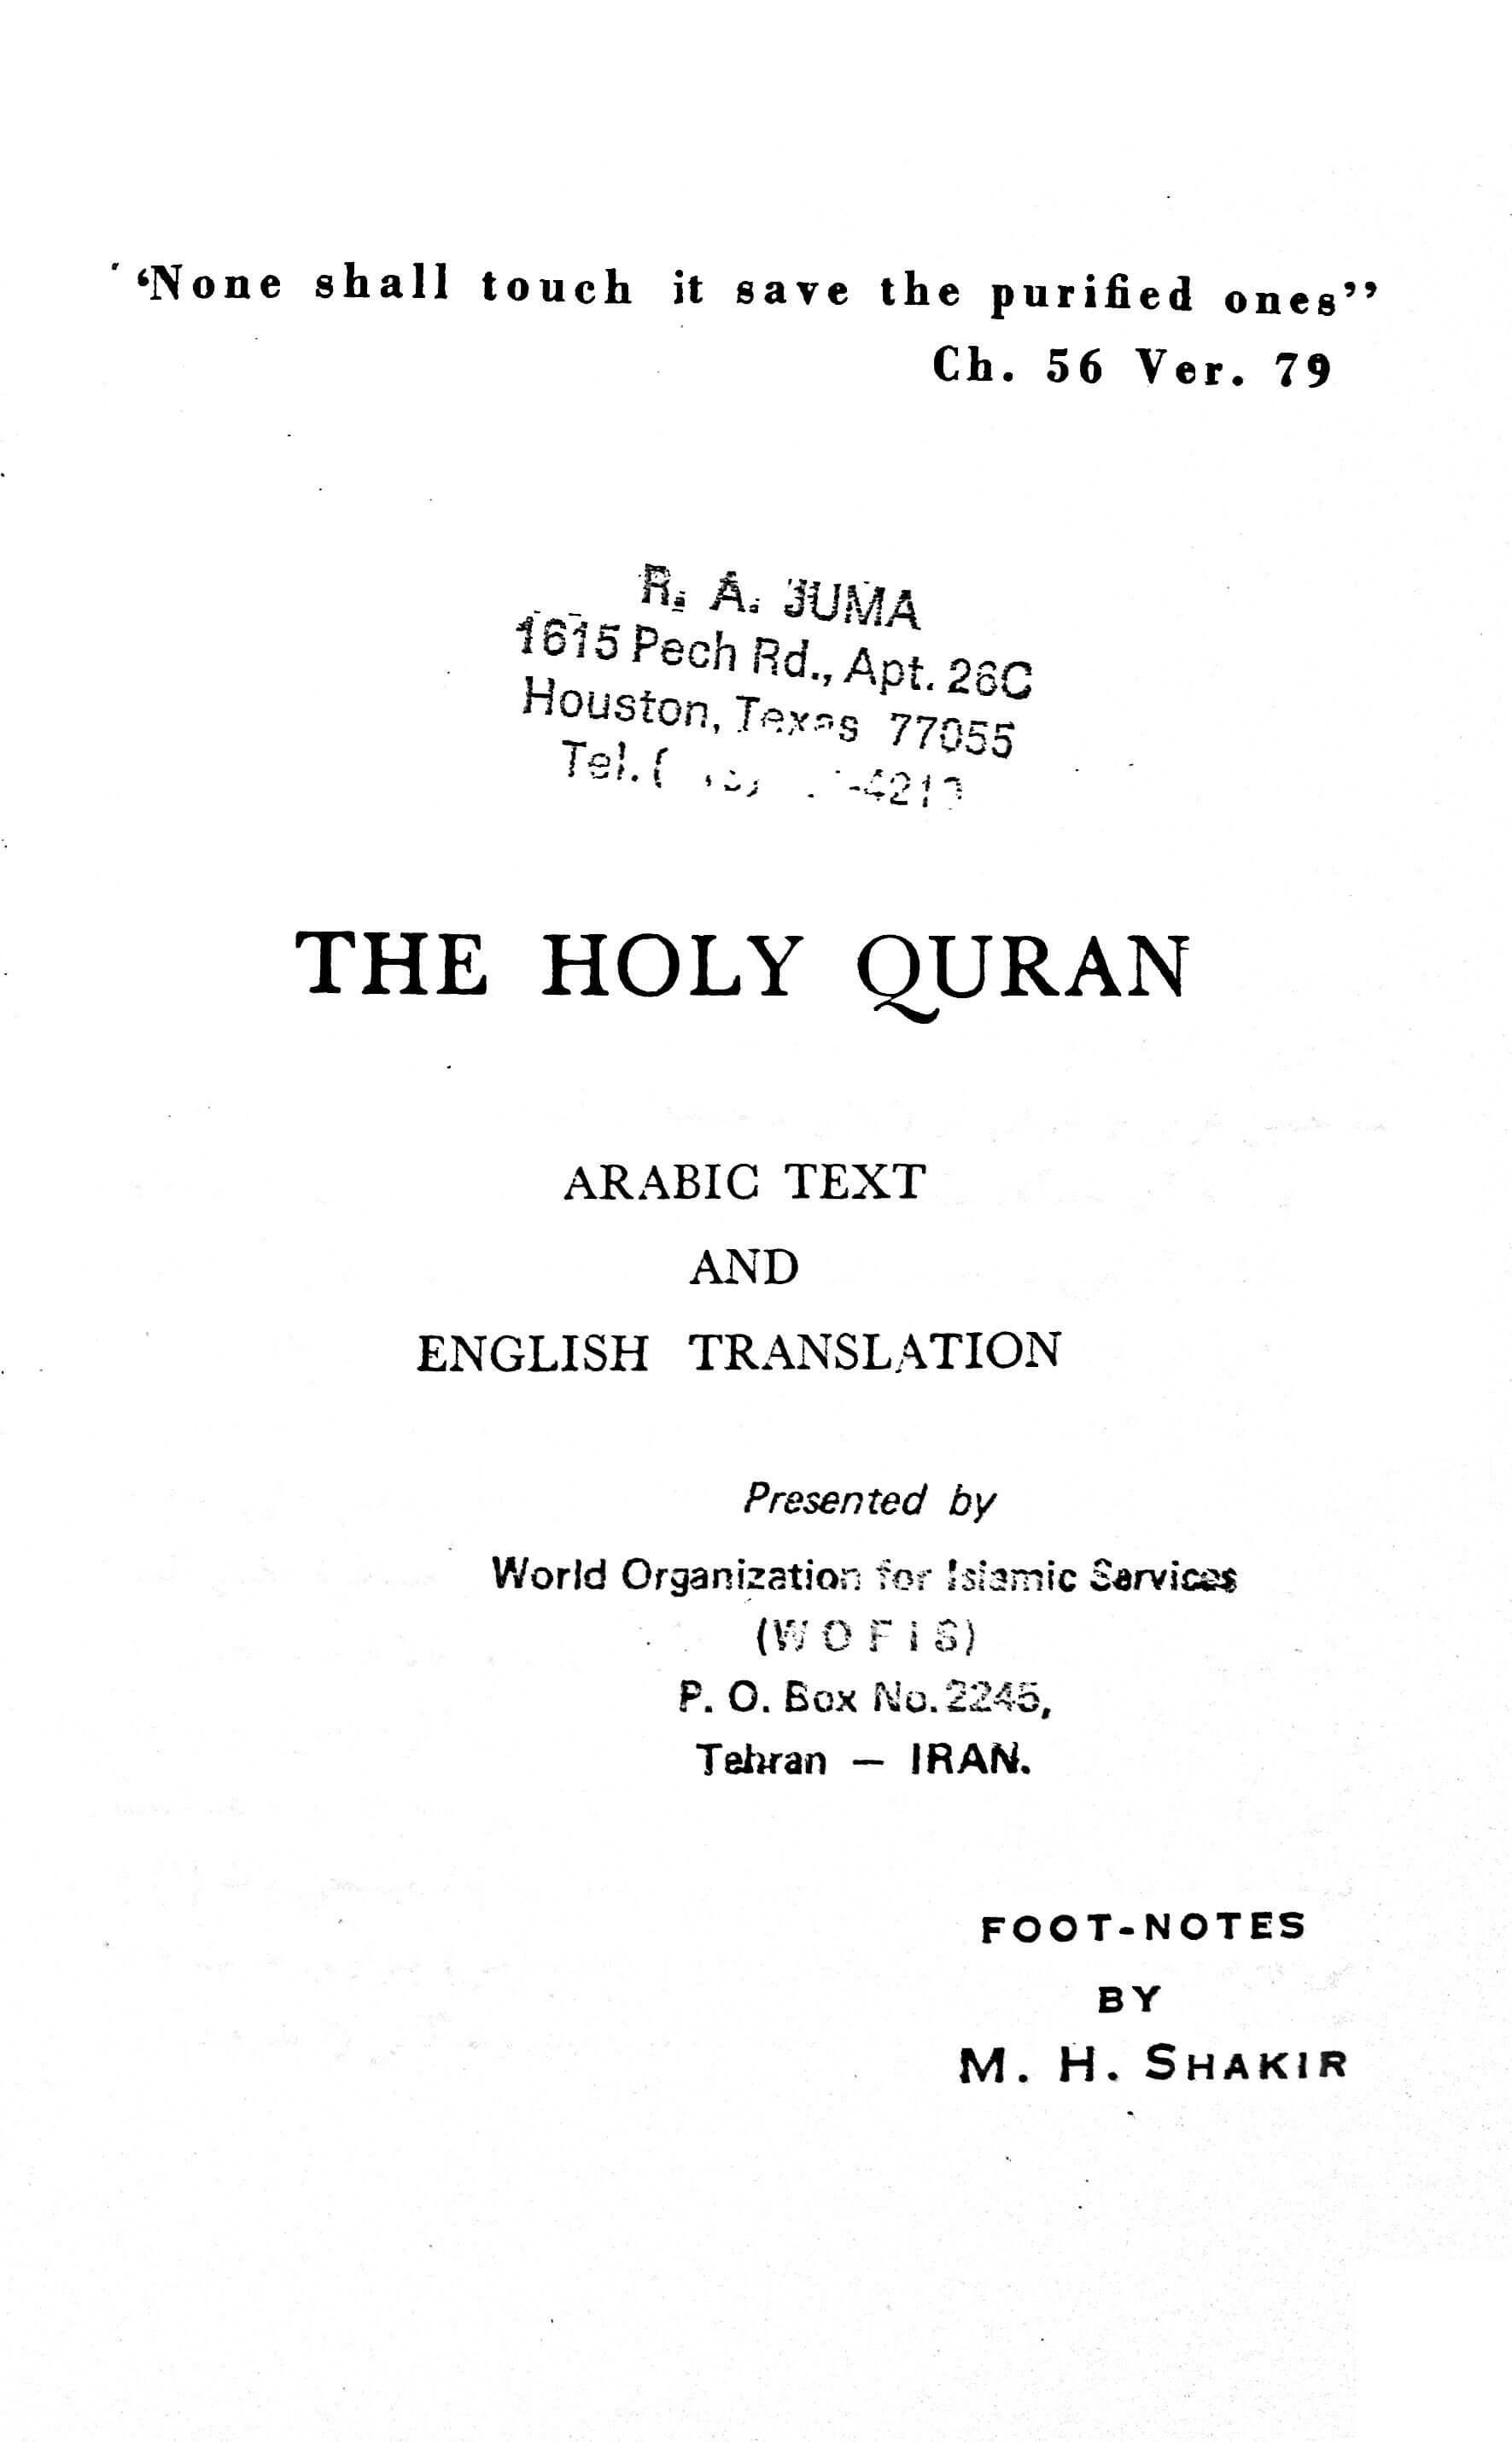 M. H. Shakir 1974 Quran Explorer, Page 1